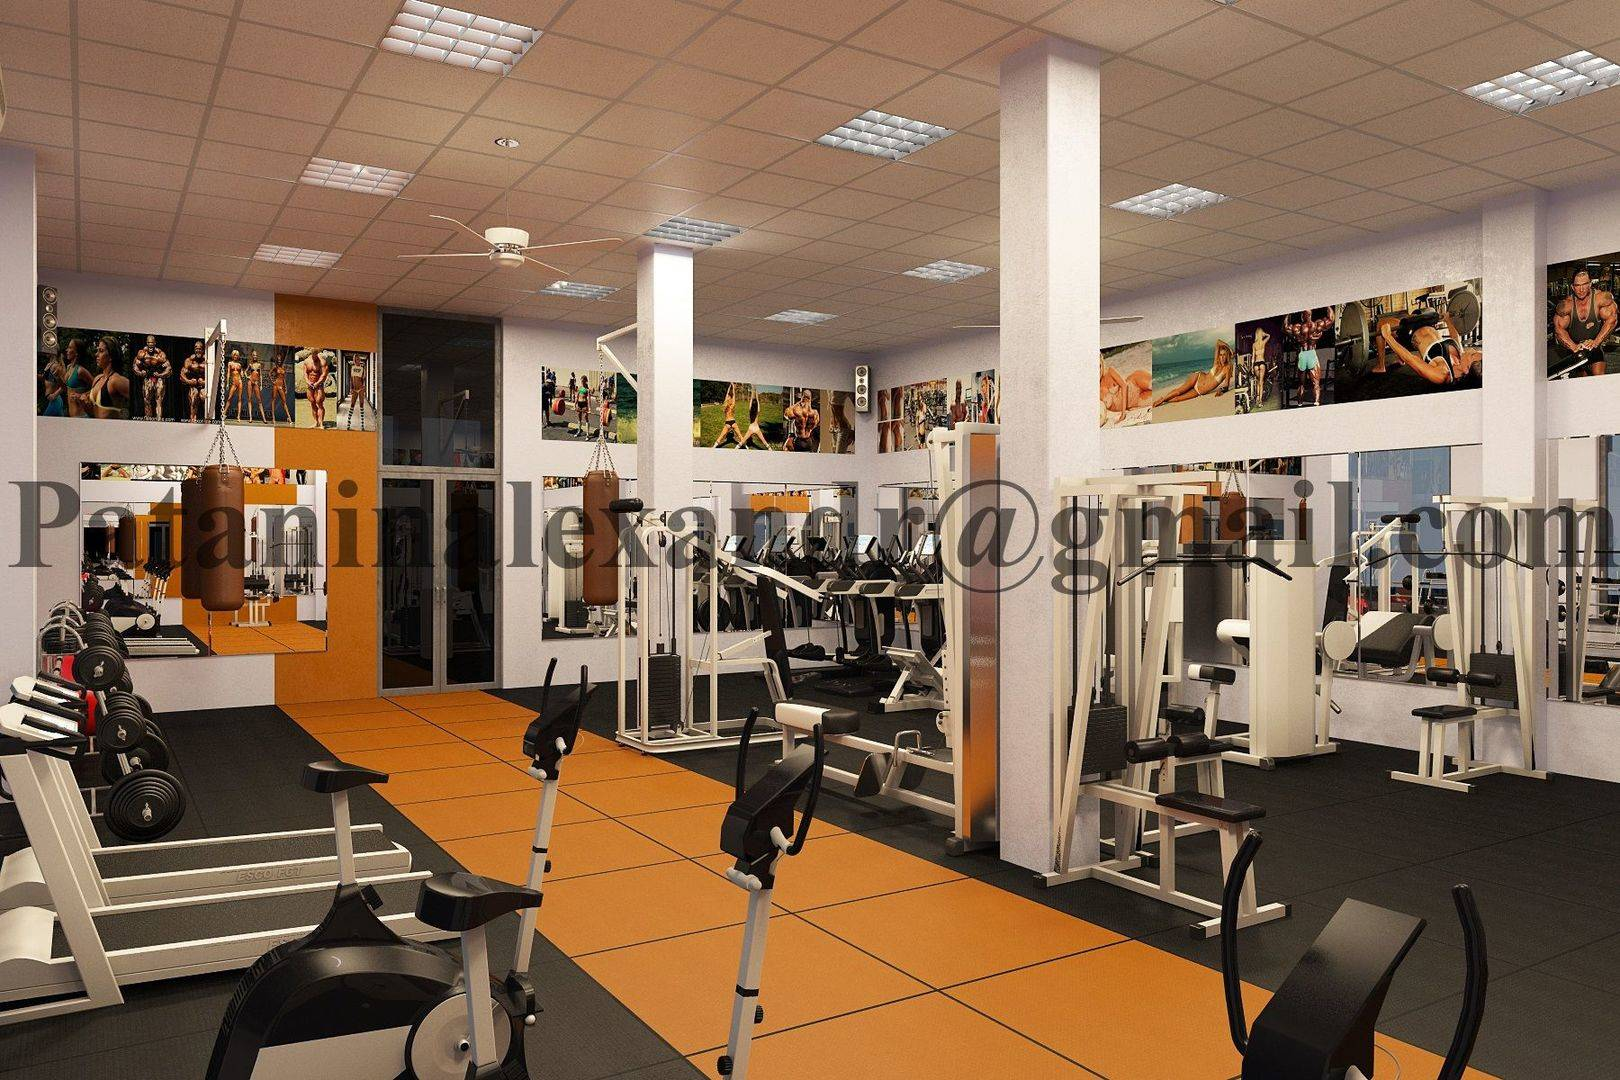 Small gym. Тренажерный зал.